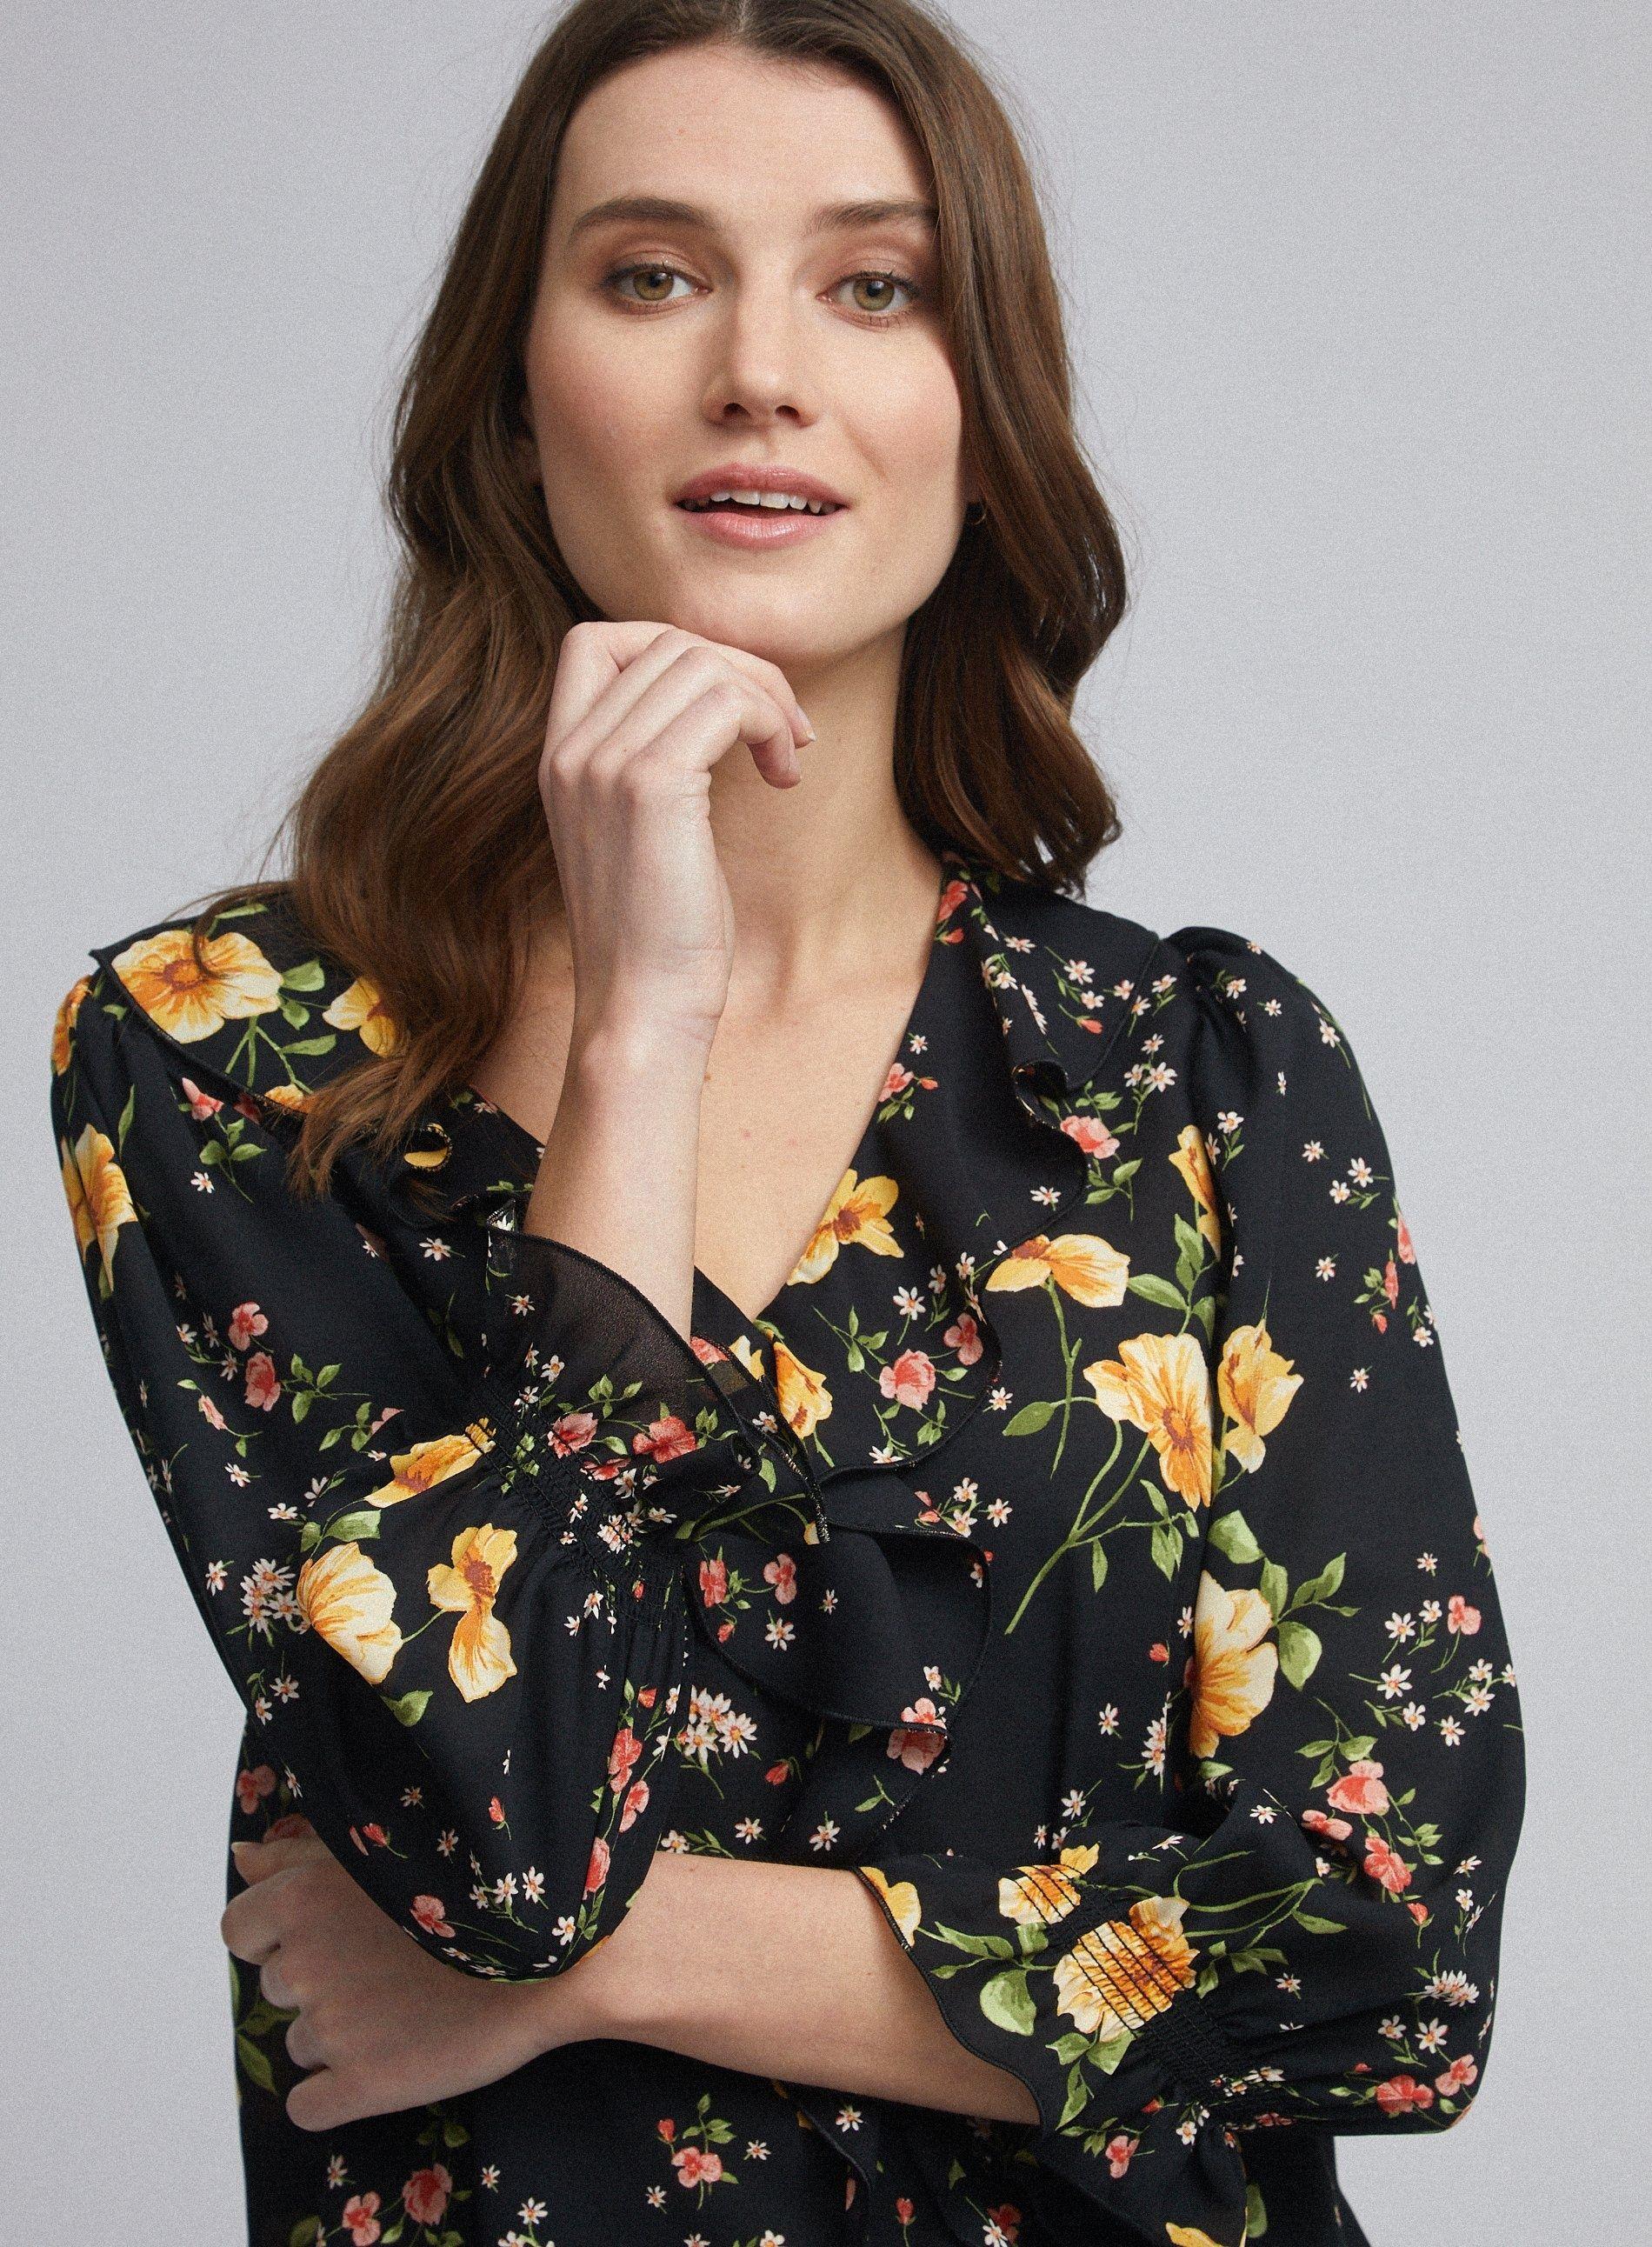 Dorothy Perkins Womens Black Floral Print Ruffle Top 3/4 Sleeve V-Neck Blouse